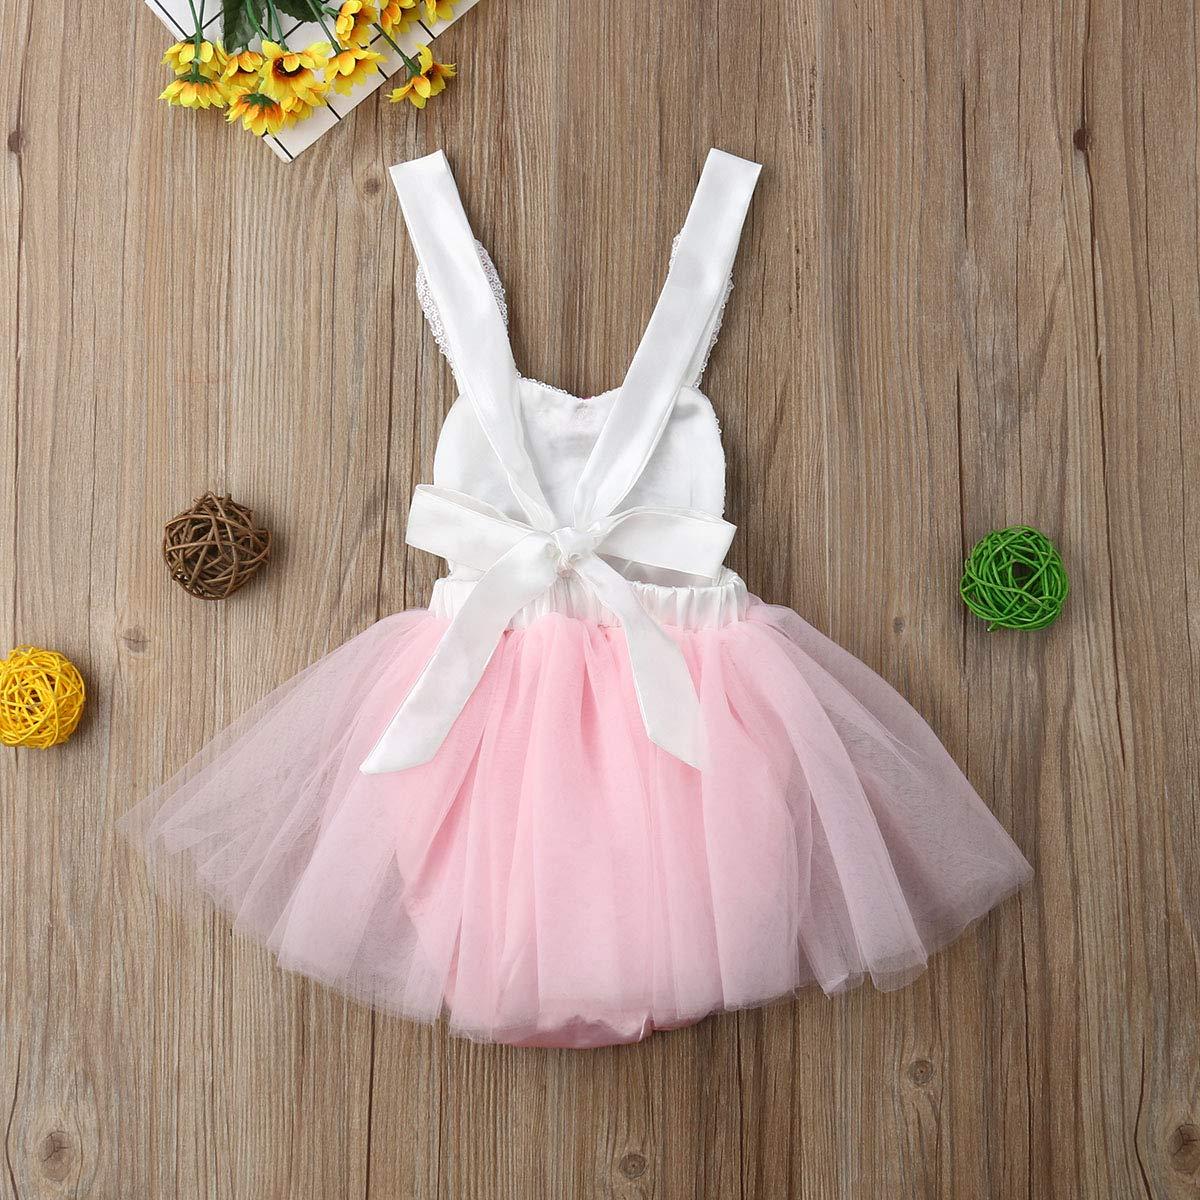 7953dcf25 Amazon.com: Newborn Infant Baby Girls Cute Bodysuit Halter Sleeveless  Romper Tutu Dress Summer Clothes 0-24M: Clothing